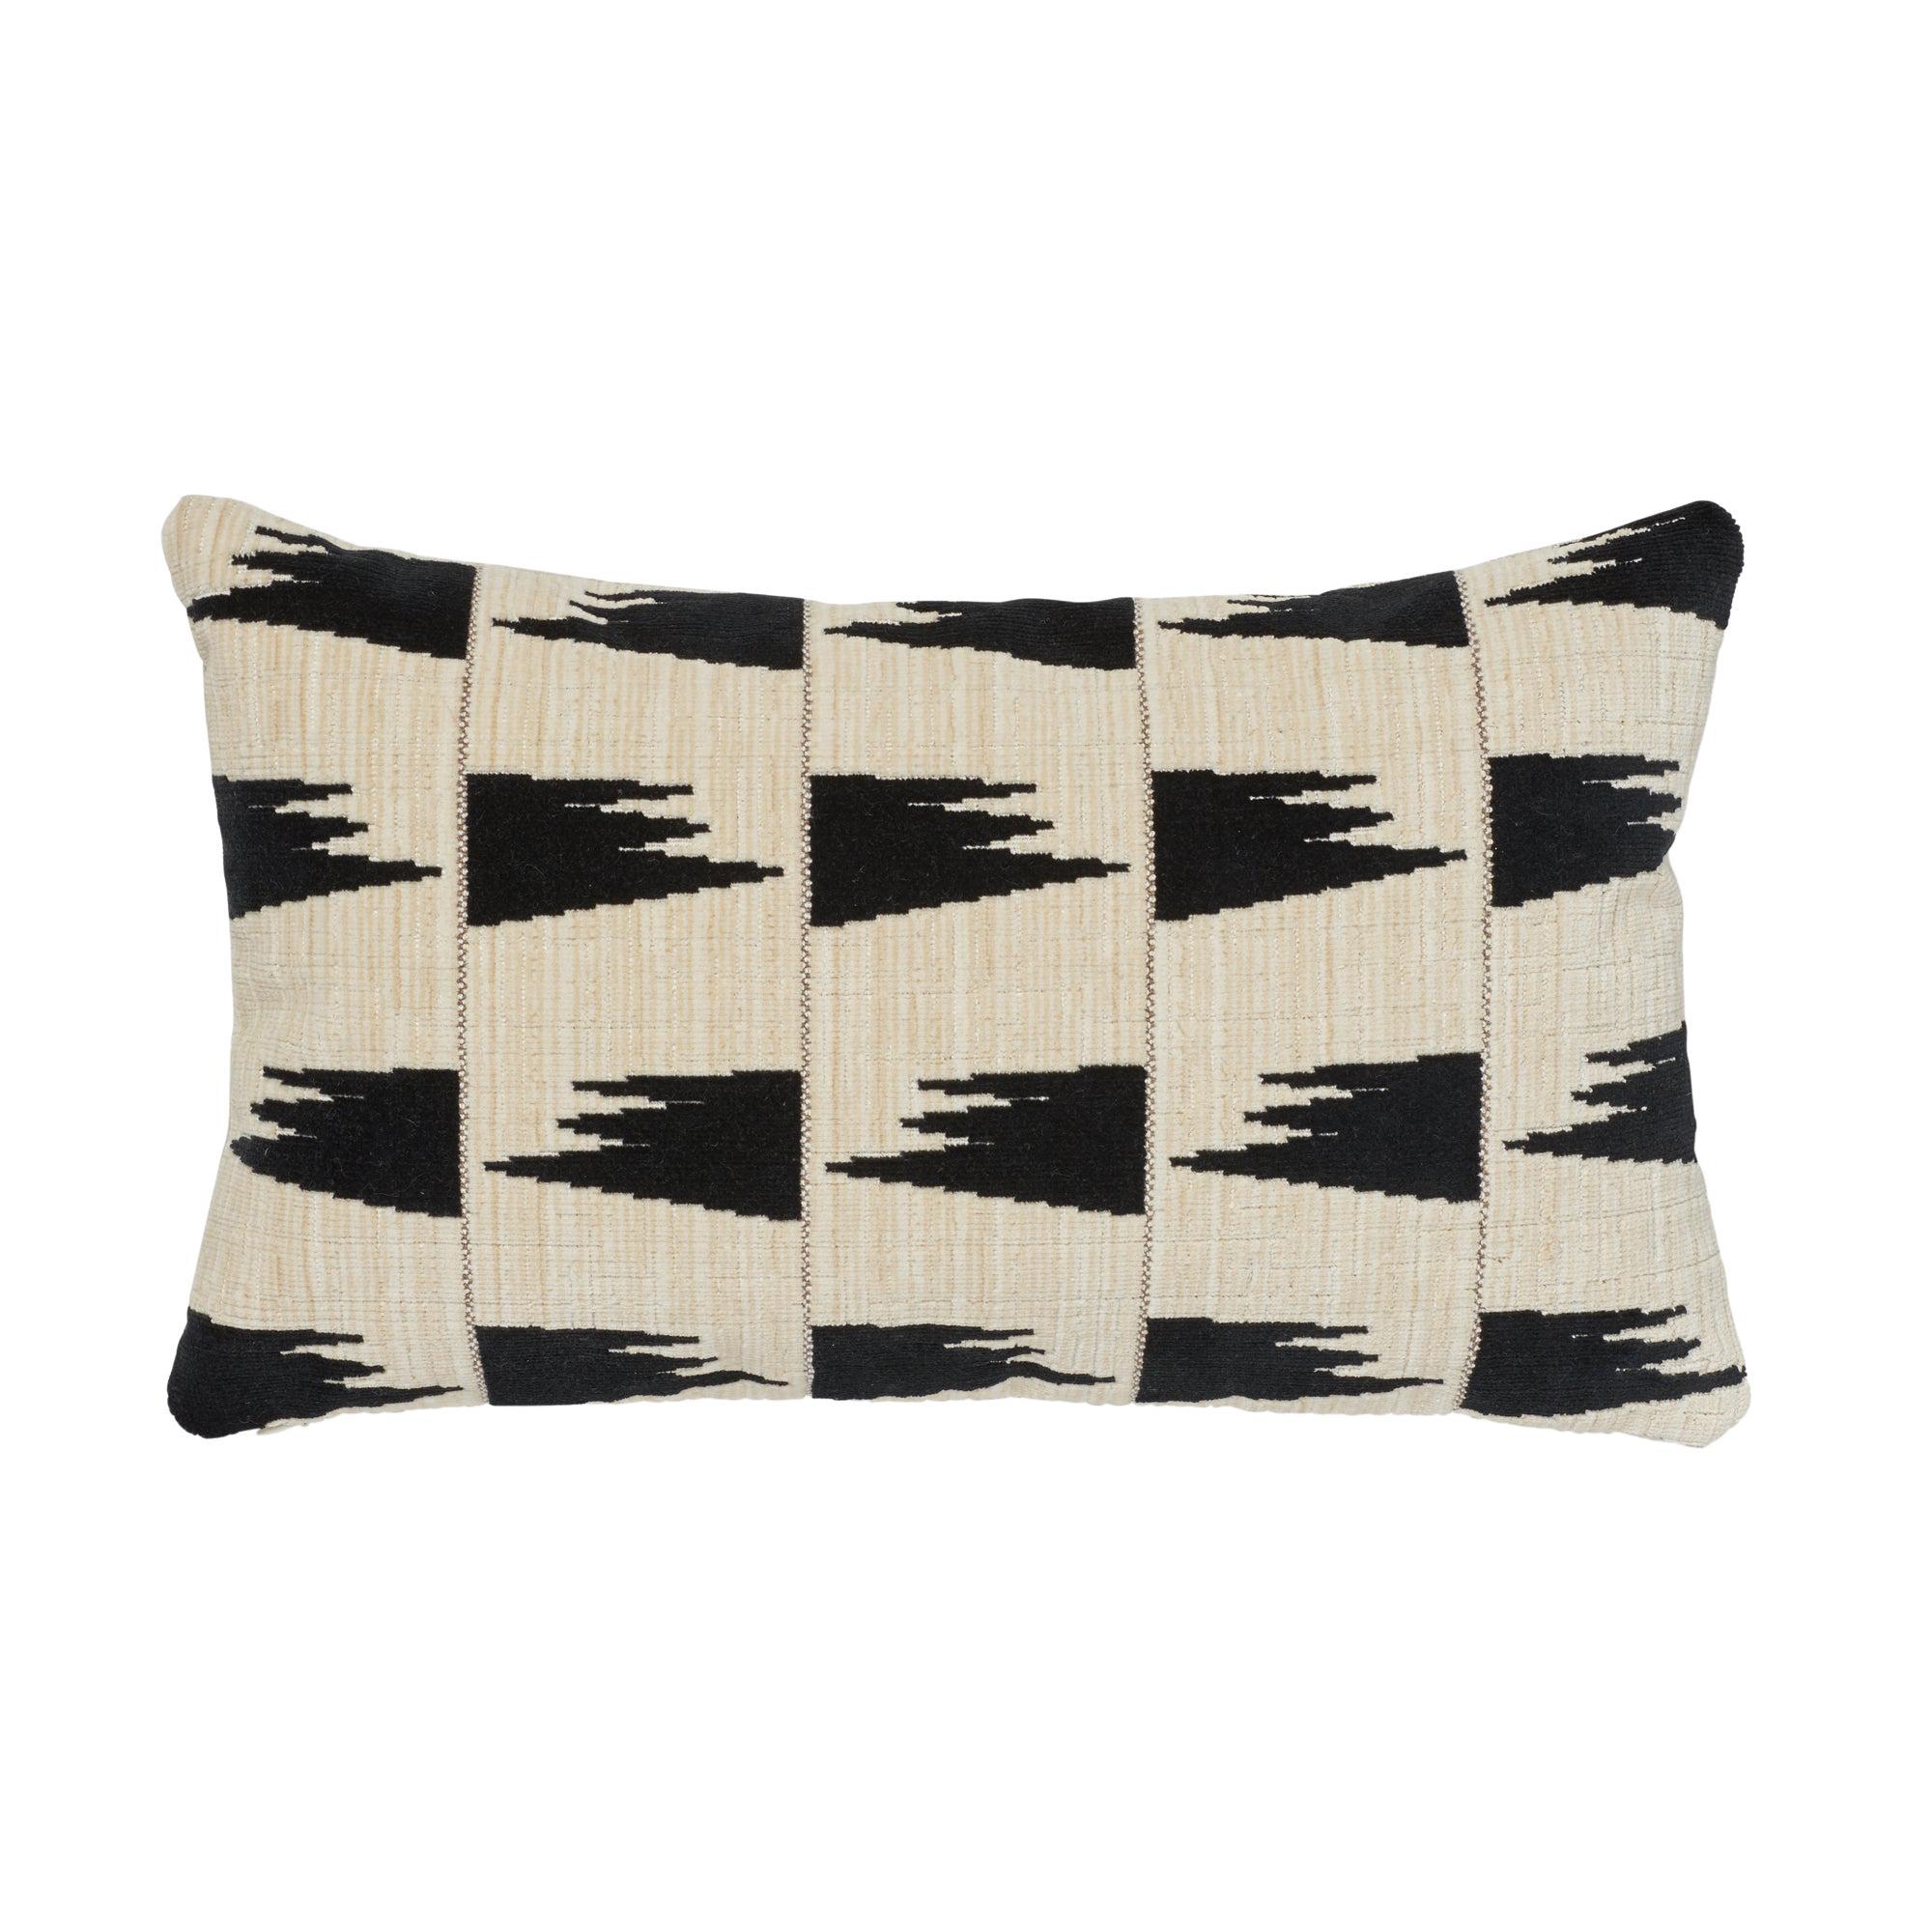 Schumacher x David Kaihoi Tutsi Ivory Cotton Linen Lumbar Pillow